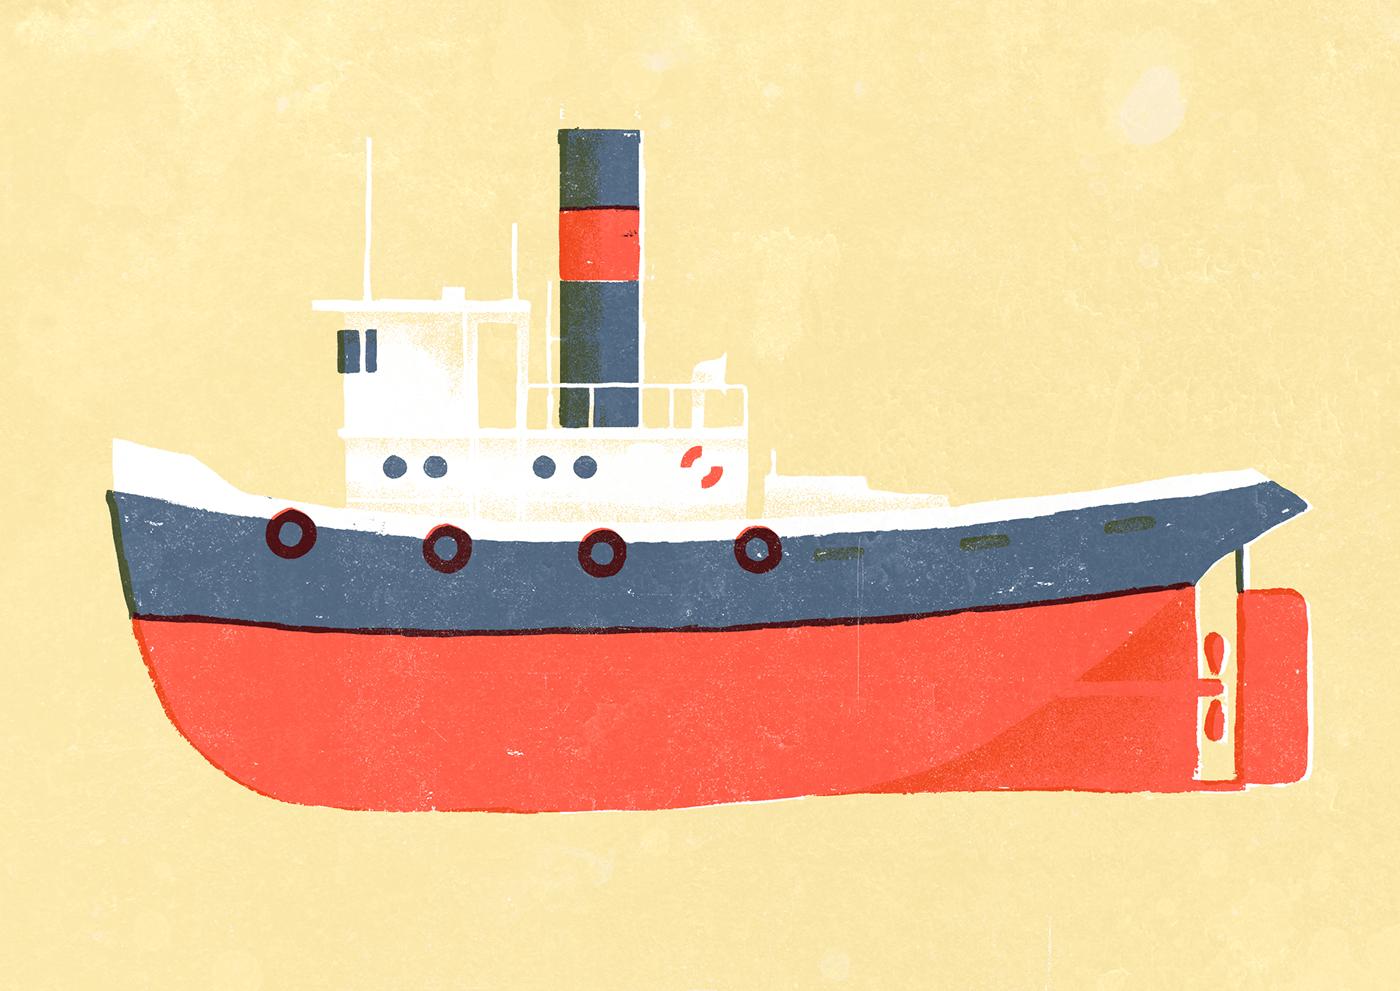 3-tone boat risograph screenprint ship vintage